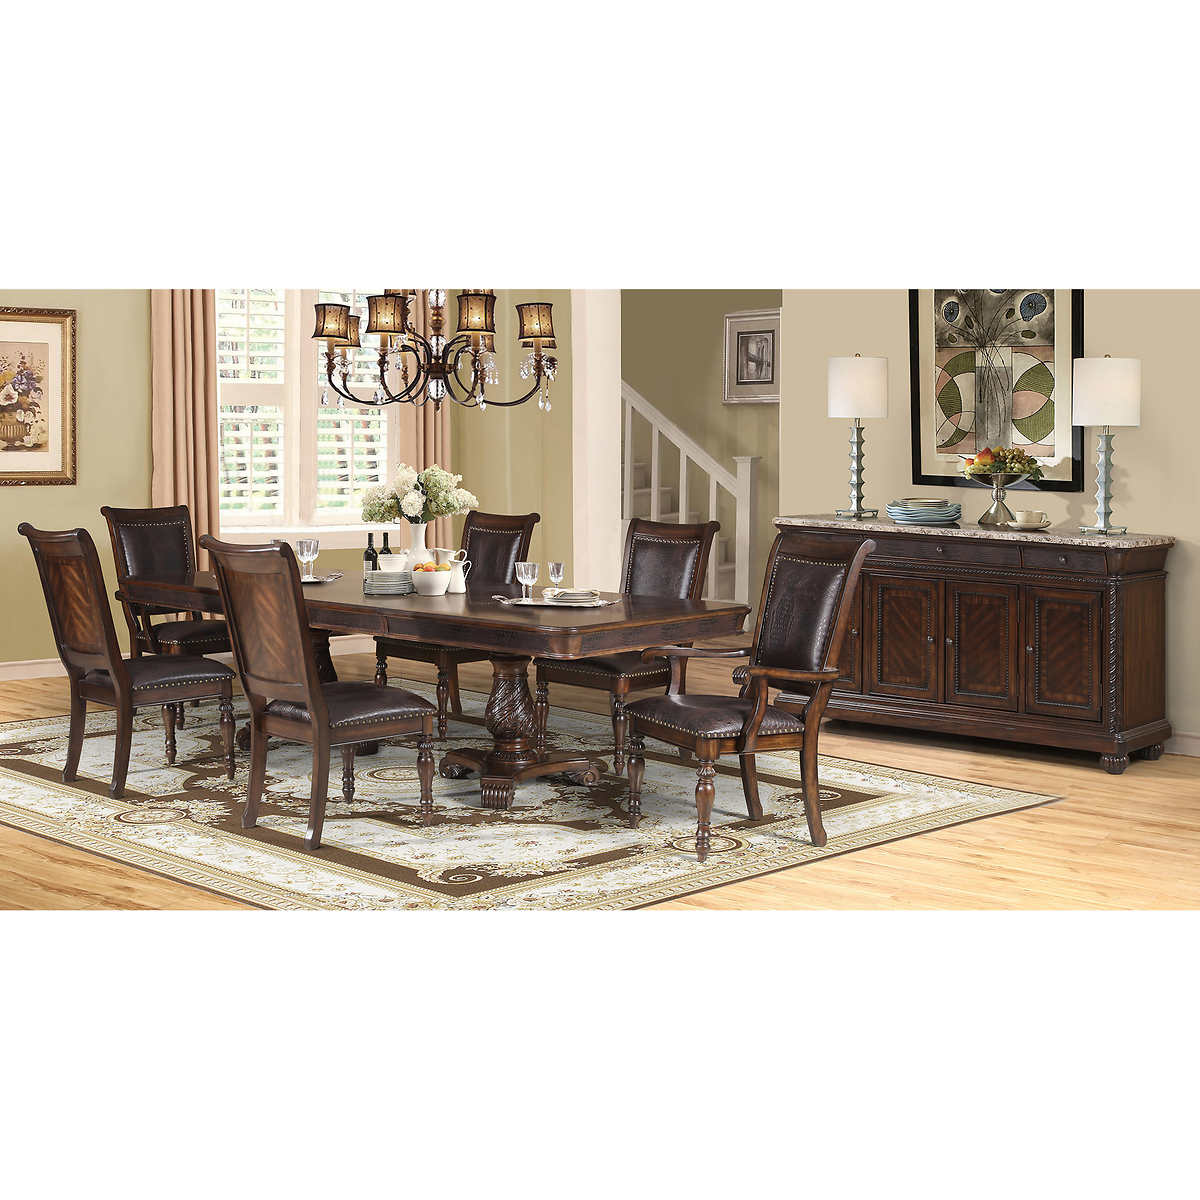 Dining room furniture ottawa